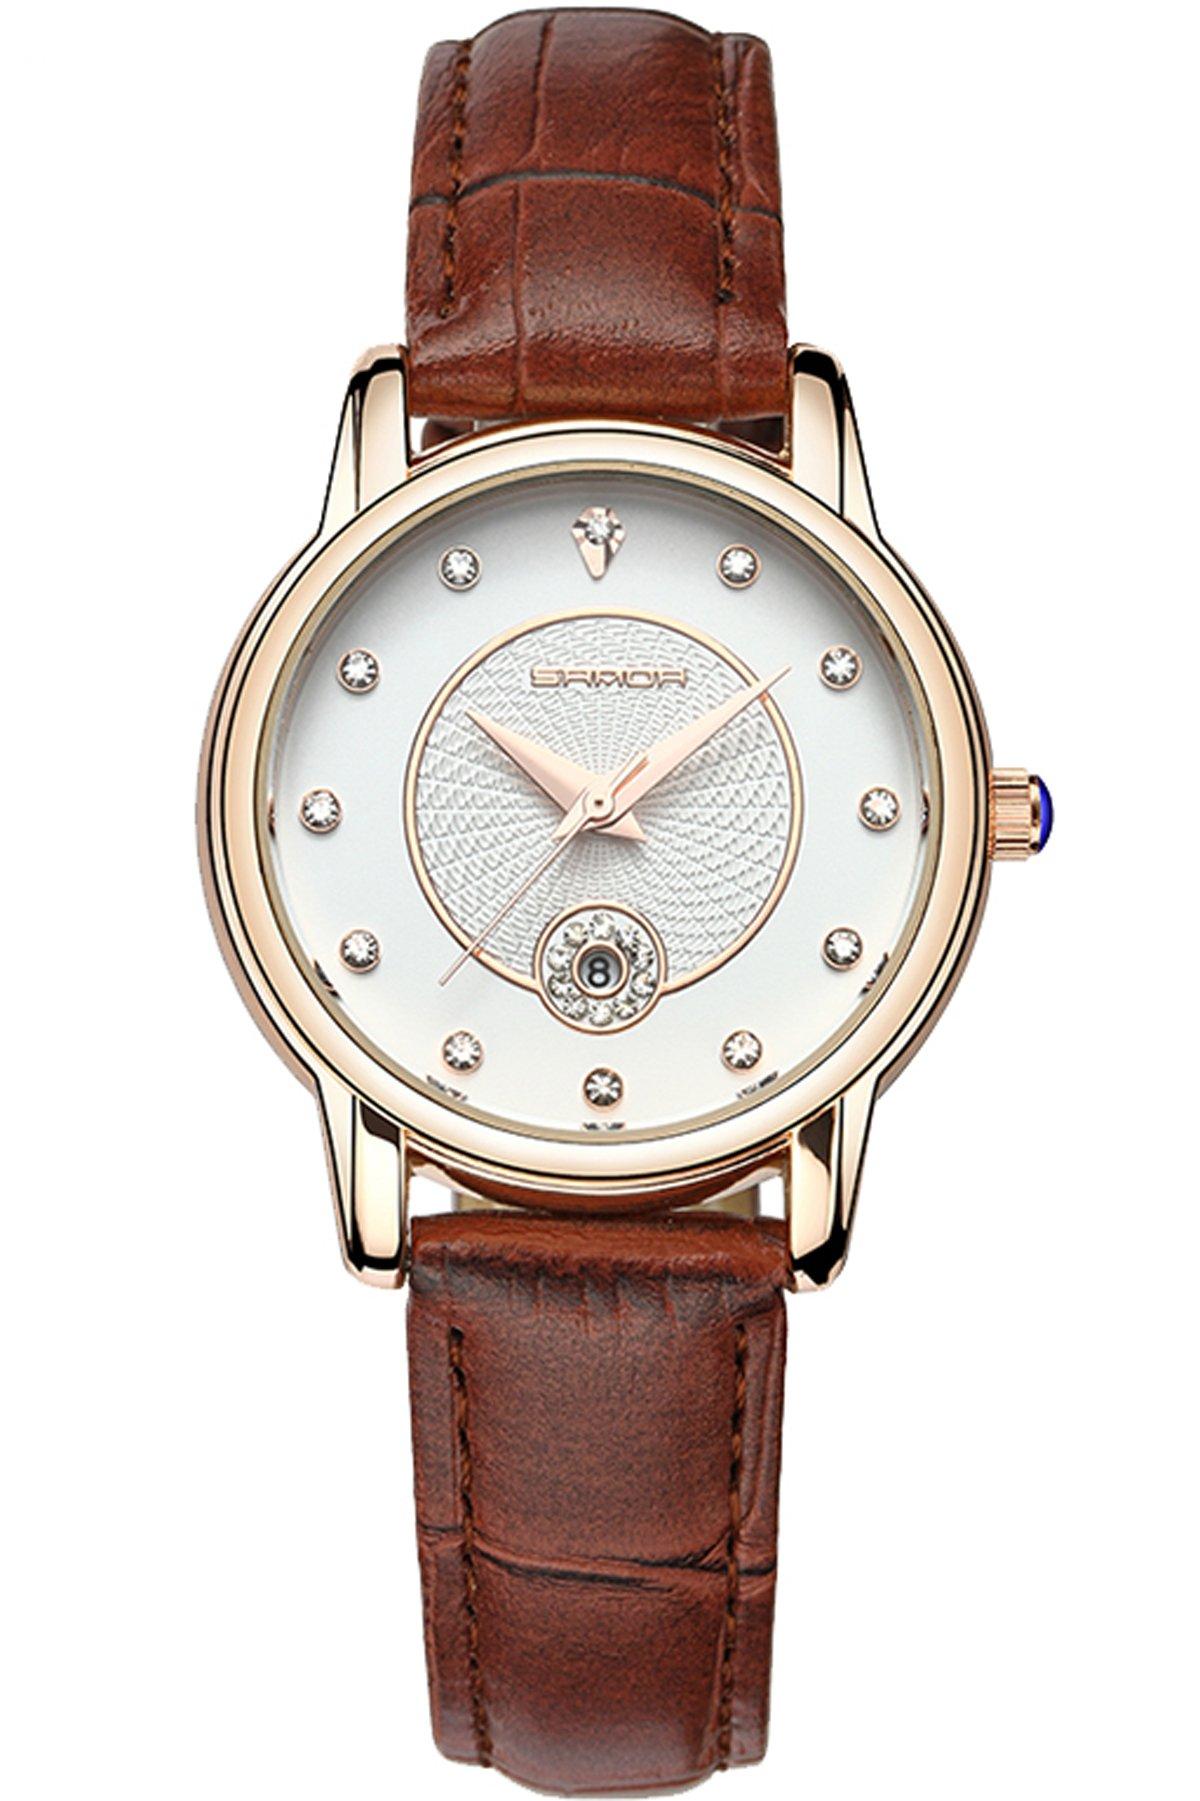 Loluka-Damenuhr-Fashion-Analog-Quarz-Leder-Armband-Elegante-Kristall-Datum-braun